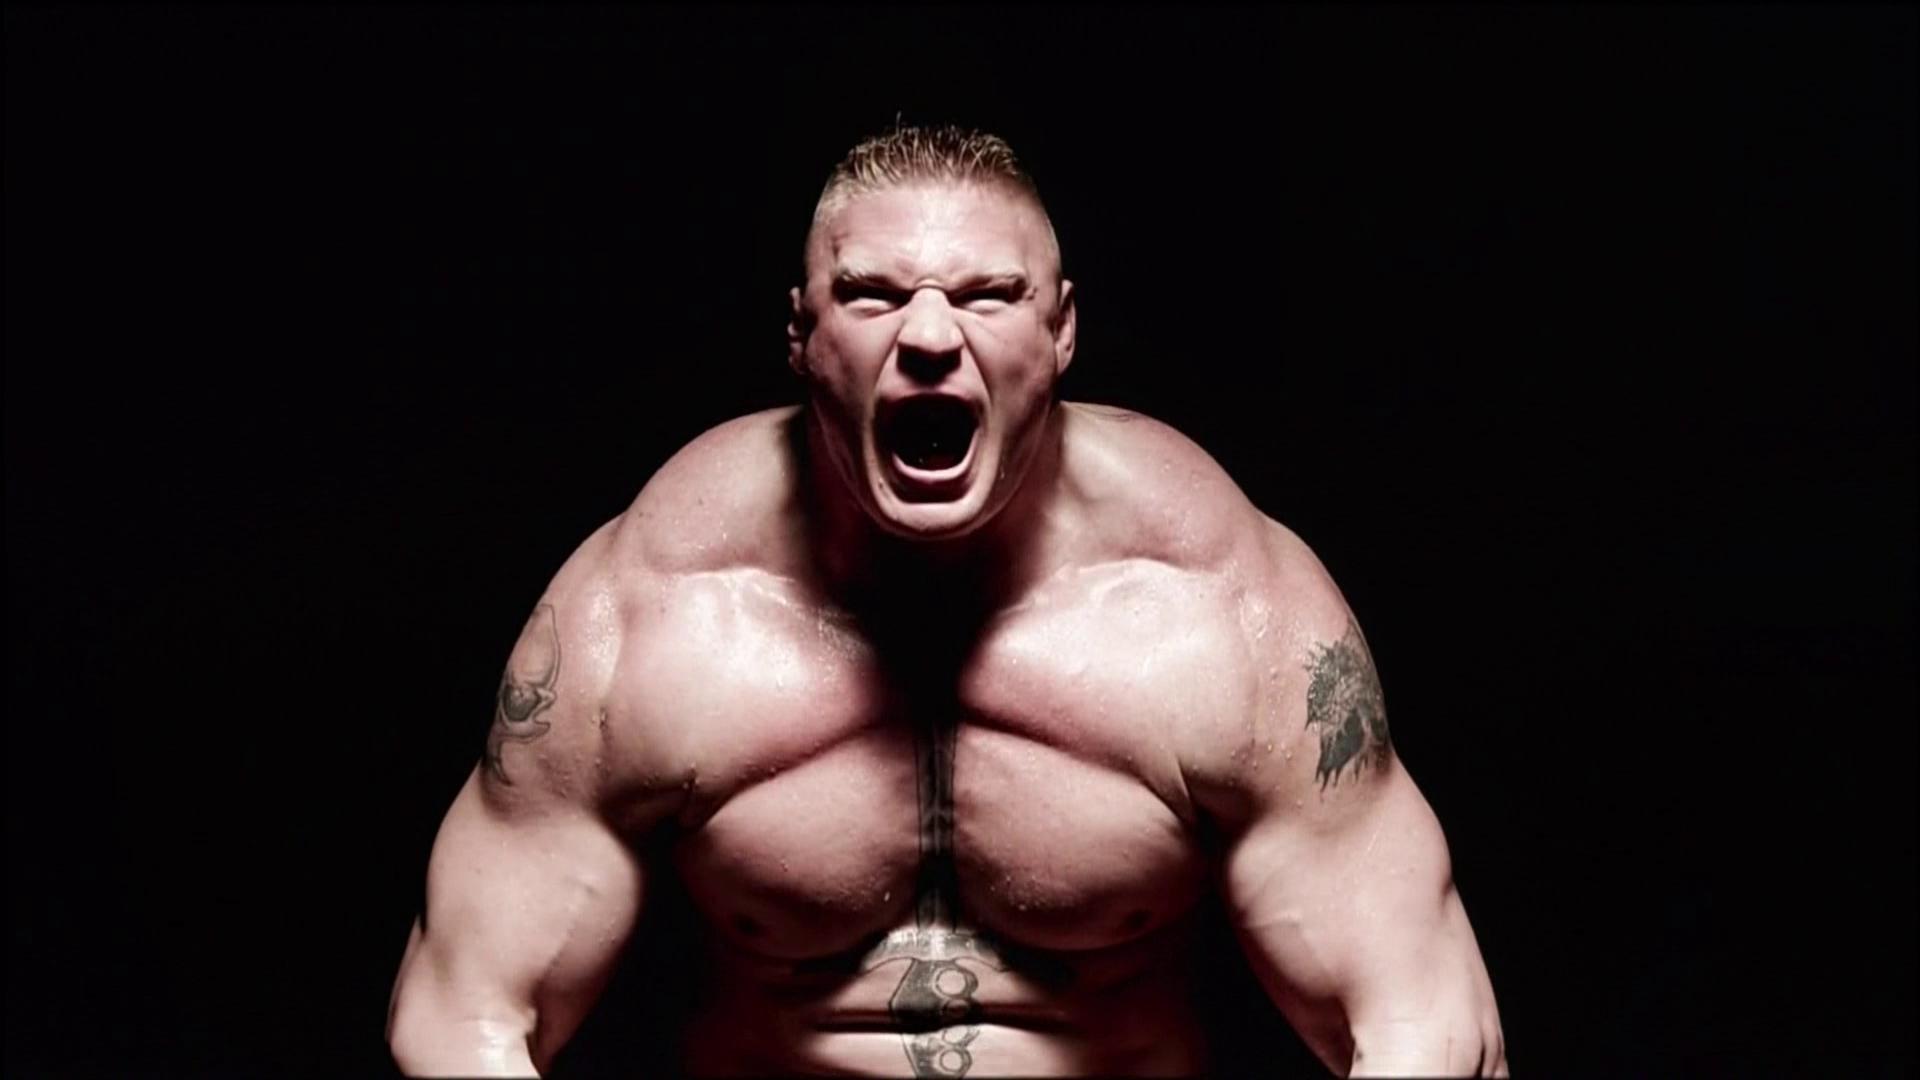 UFC brock lesner mma martial fighting 22 wallpaper 1920x1080 1920x1080